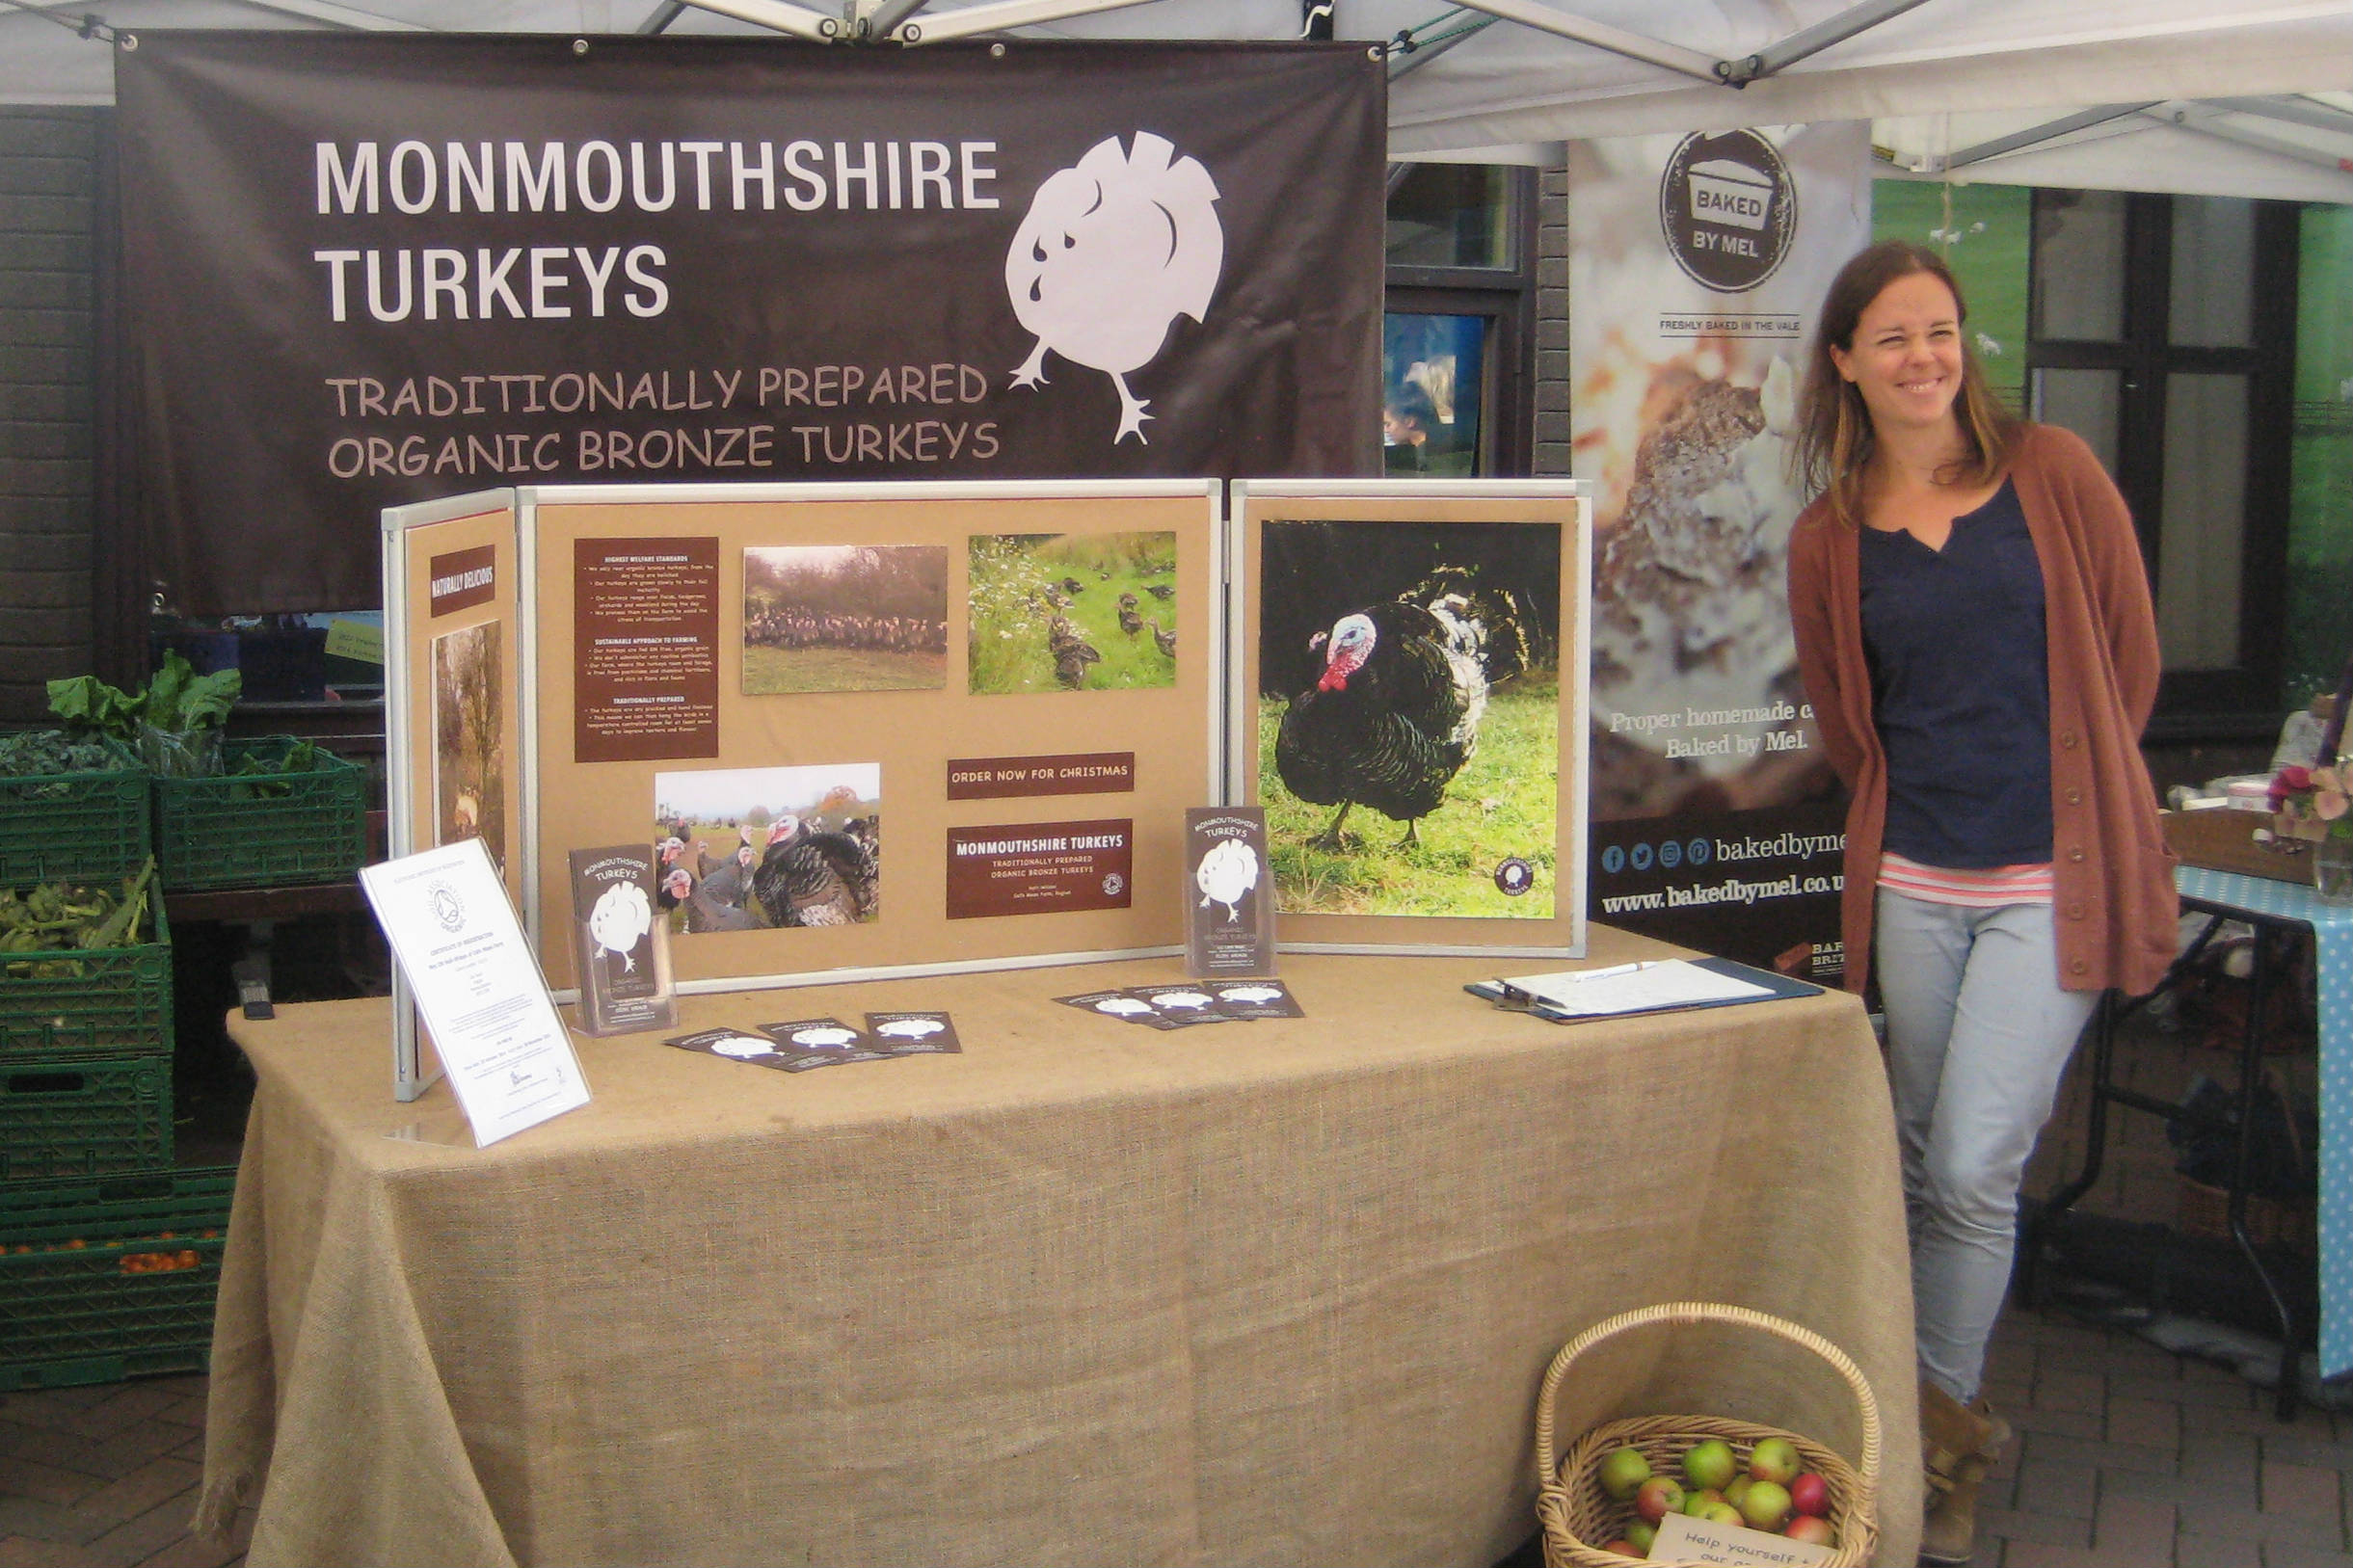 Monmouthshire Turkeys